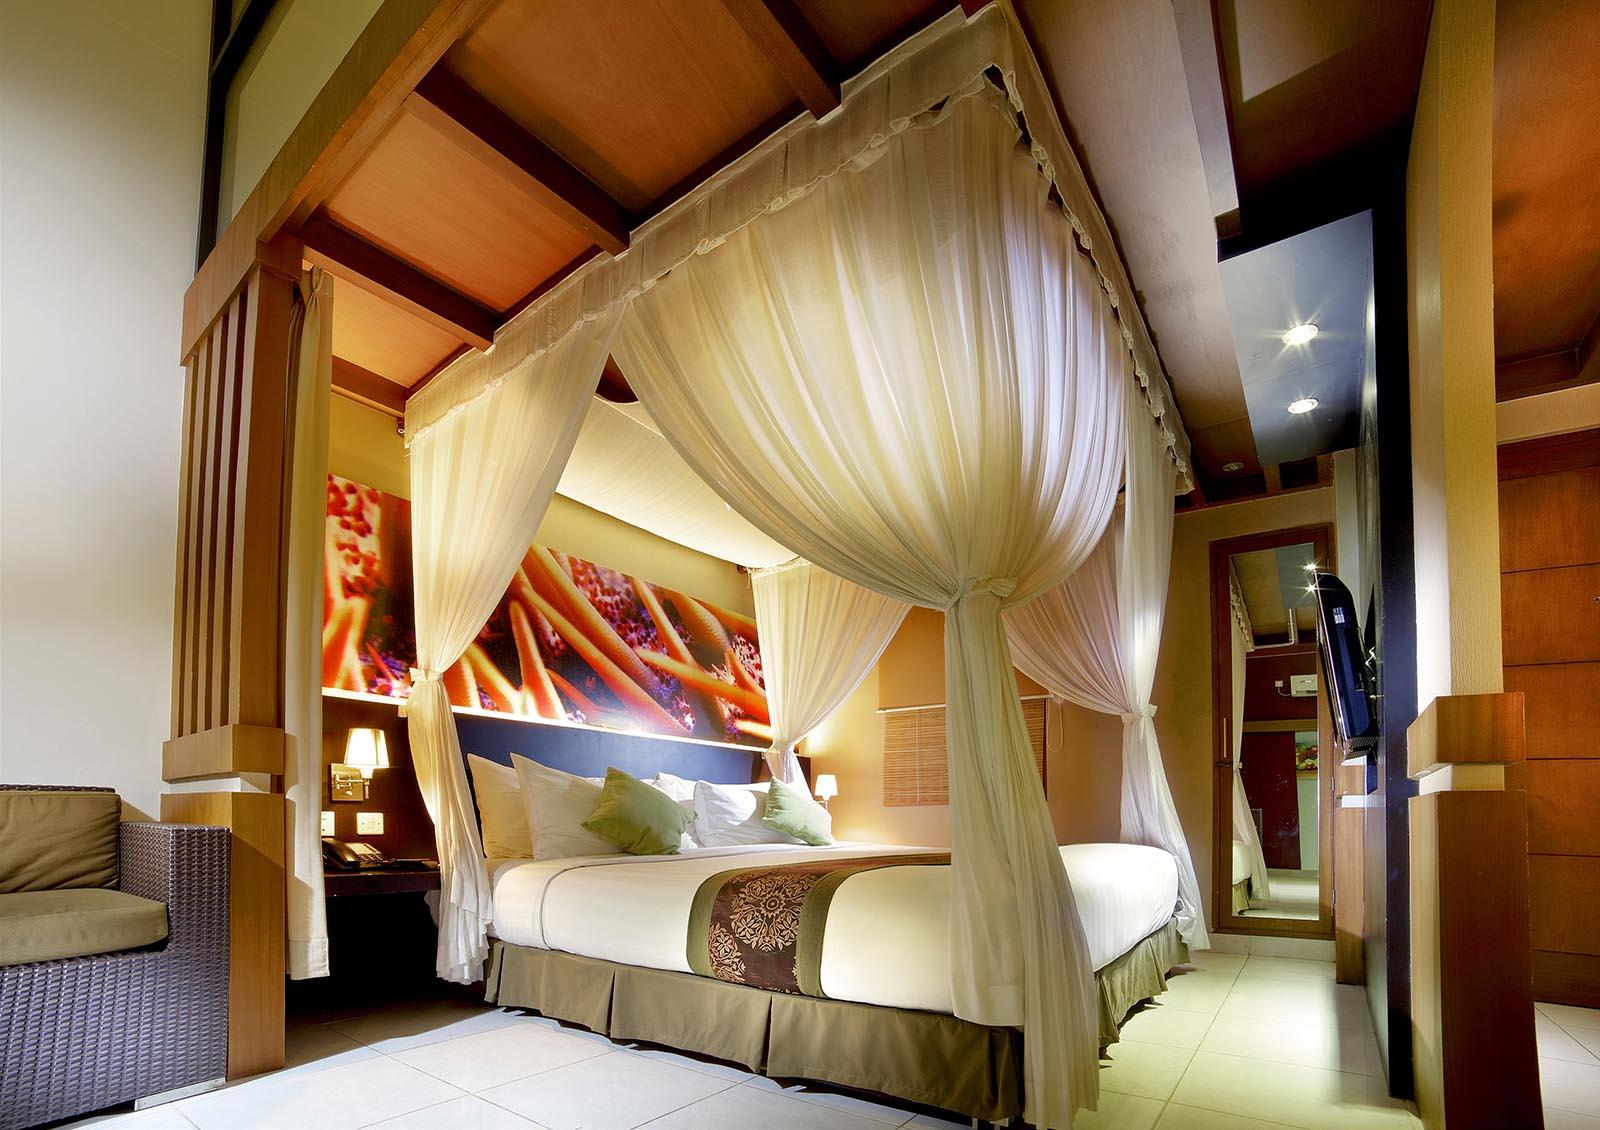 2 Bedrooms Premiere Family Suite